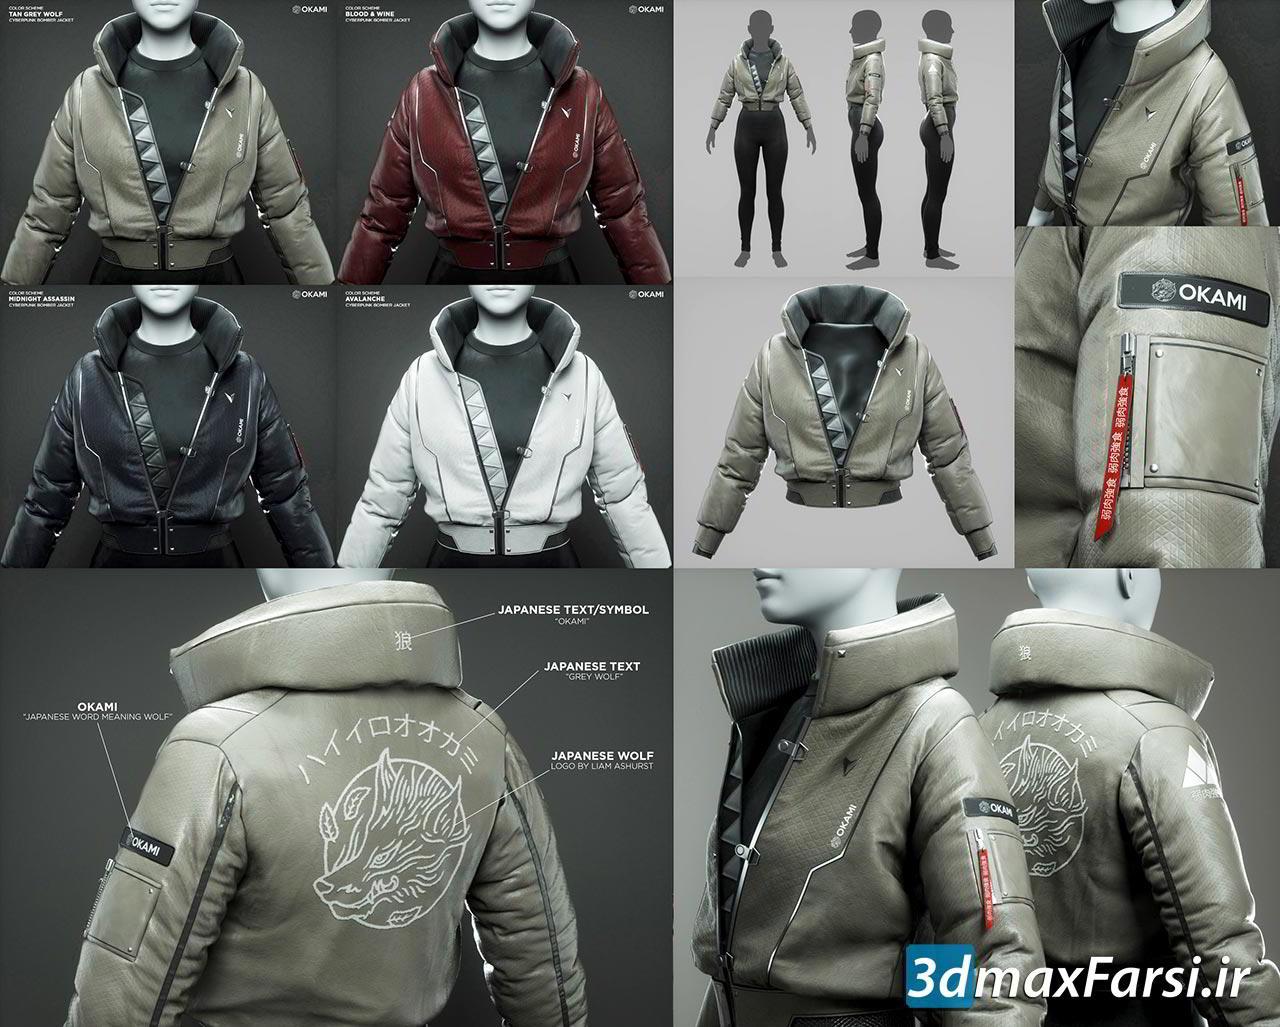 آموزش طراحی سه بعدی لباس مارلوس دیزاینر flippednormals - cyberpunk bomber jacket - 3d fashion design course